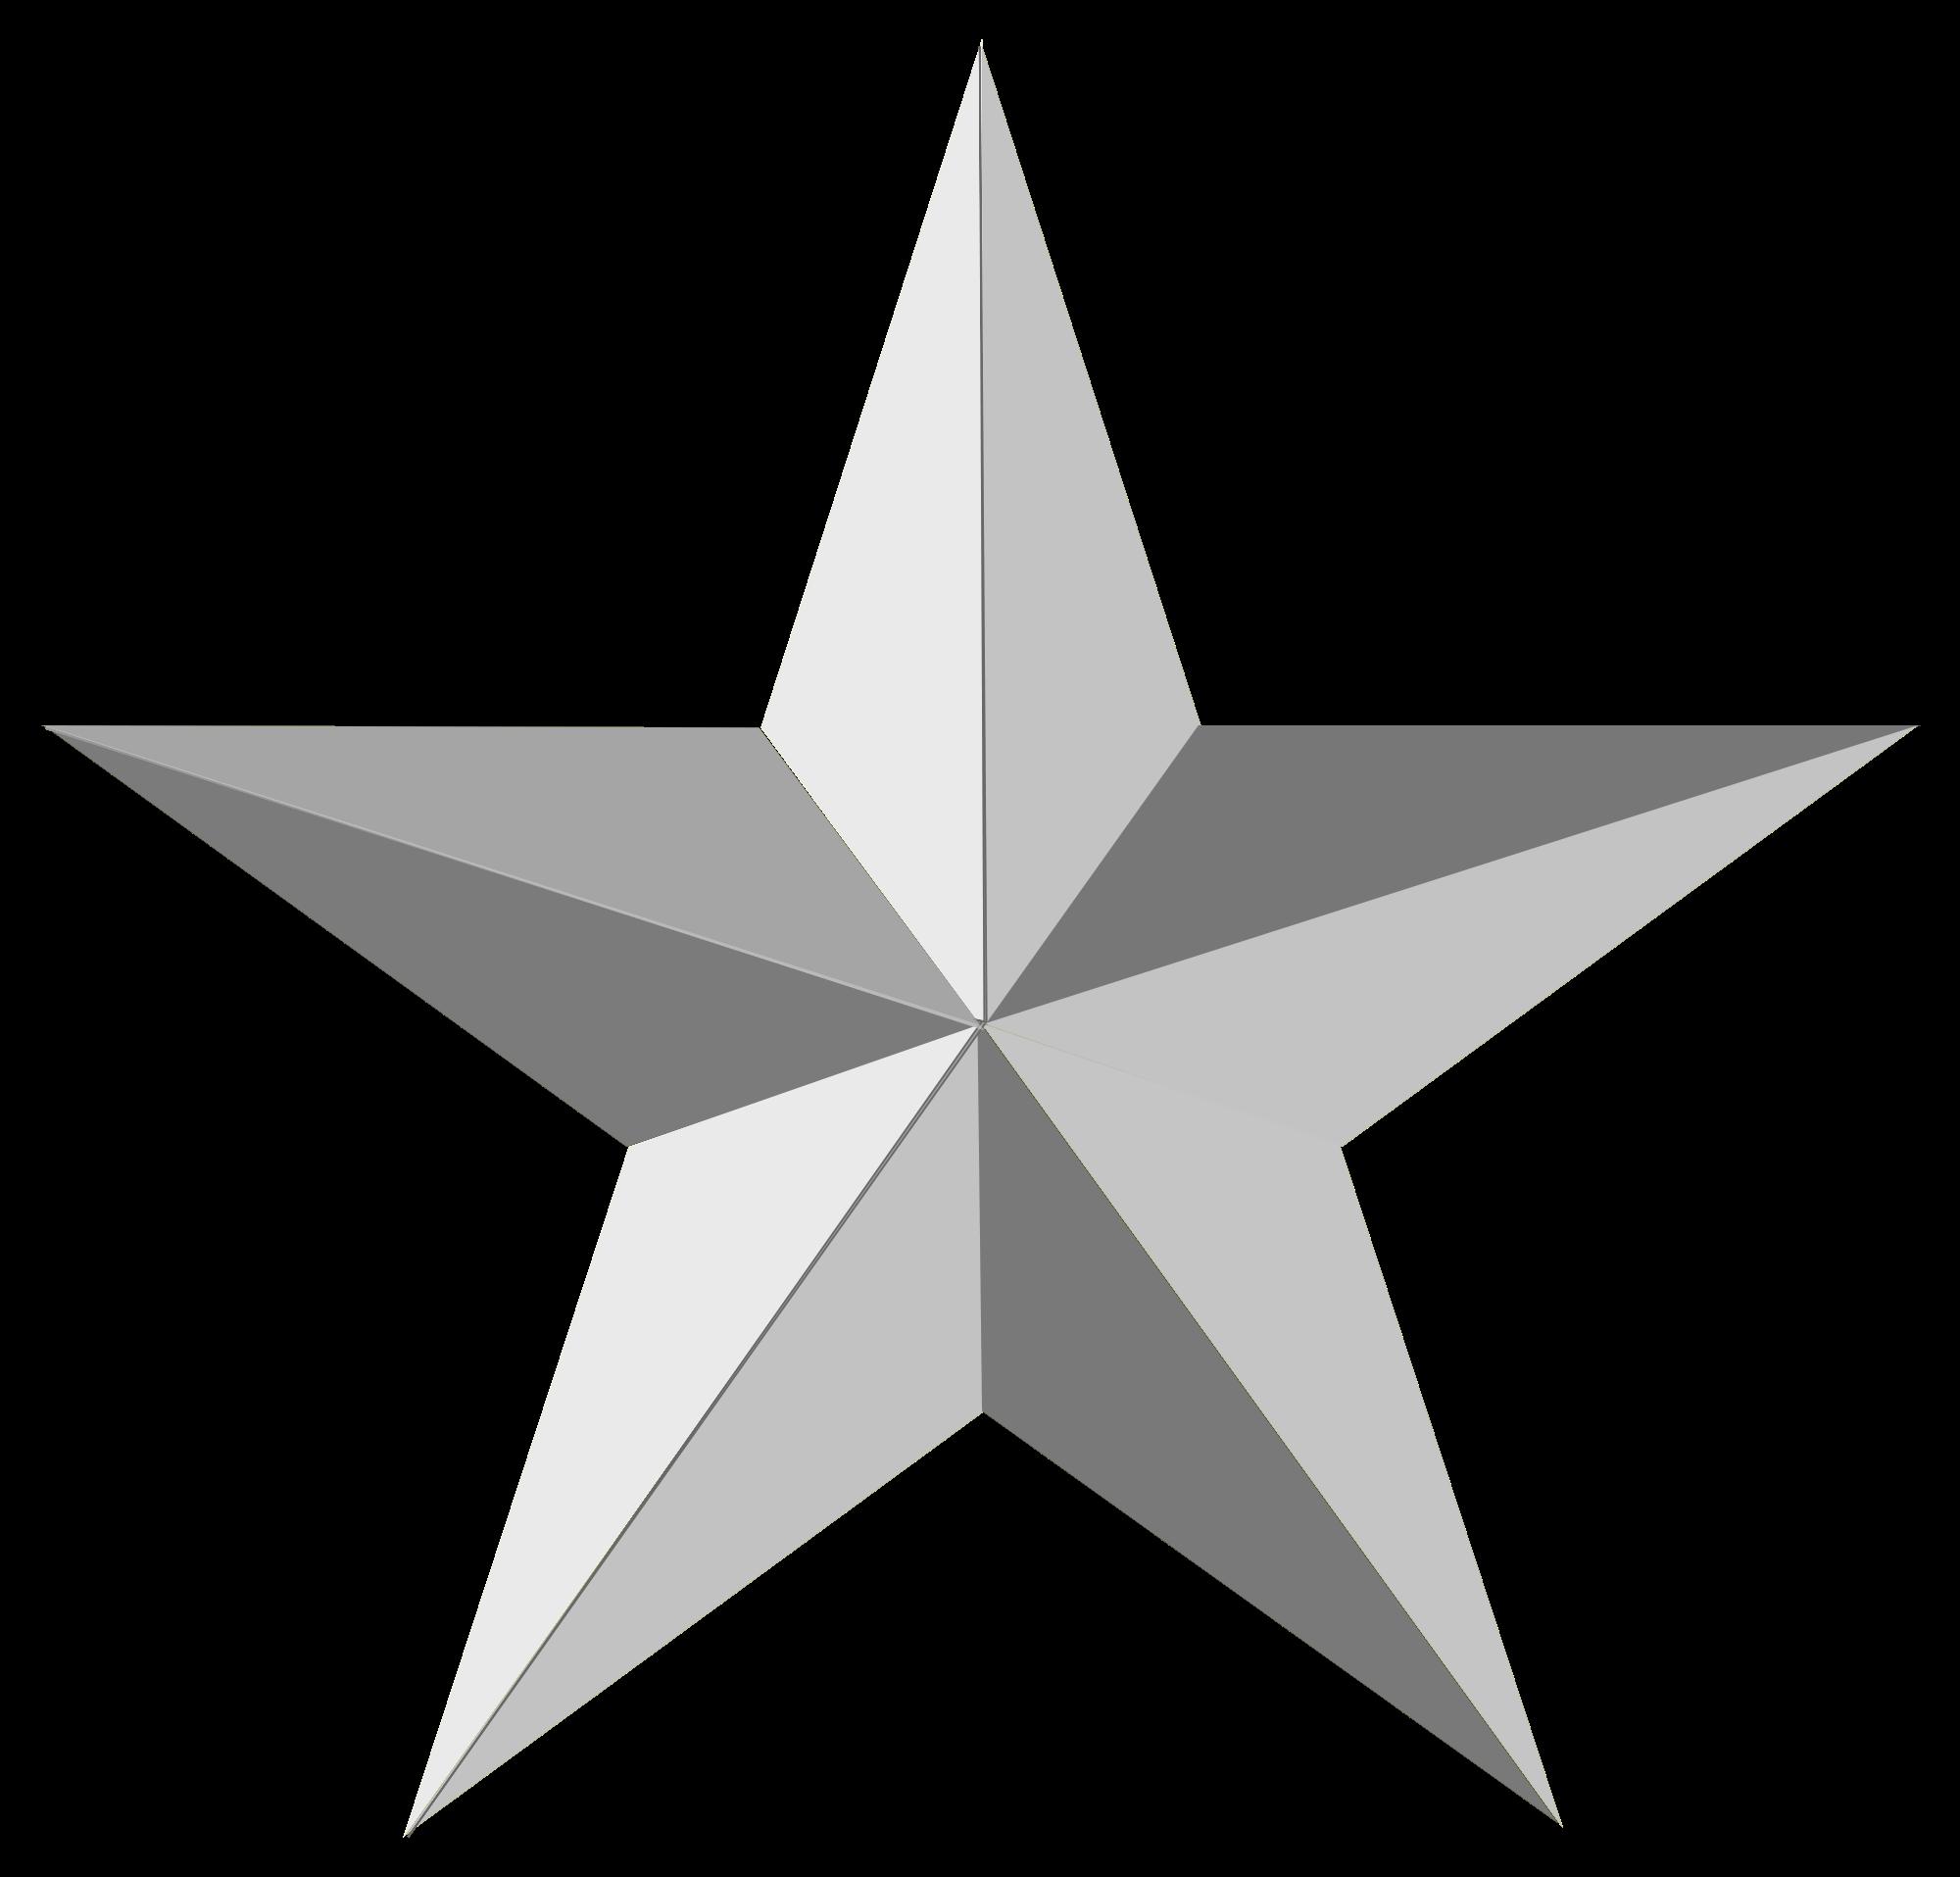 gray star PNG image